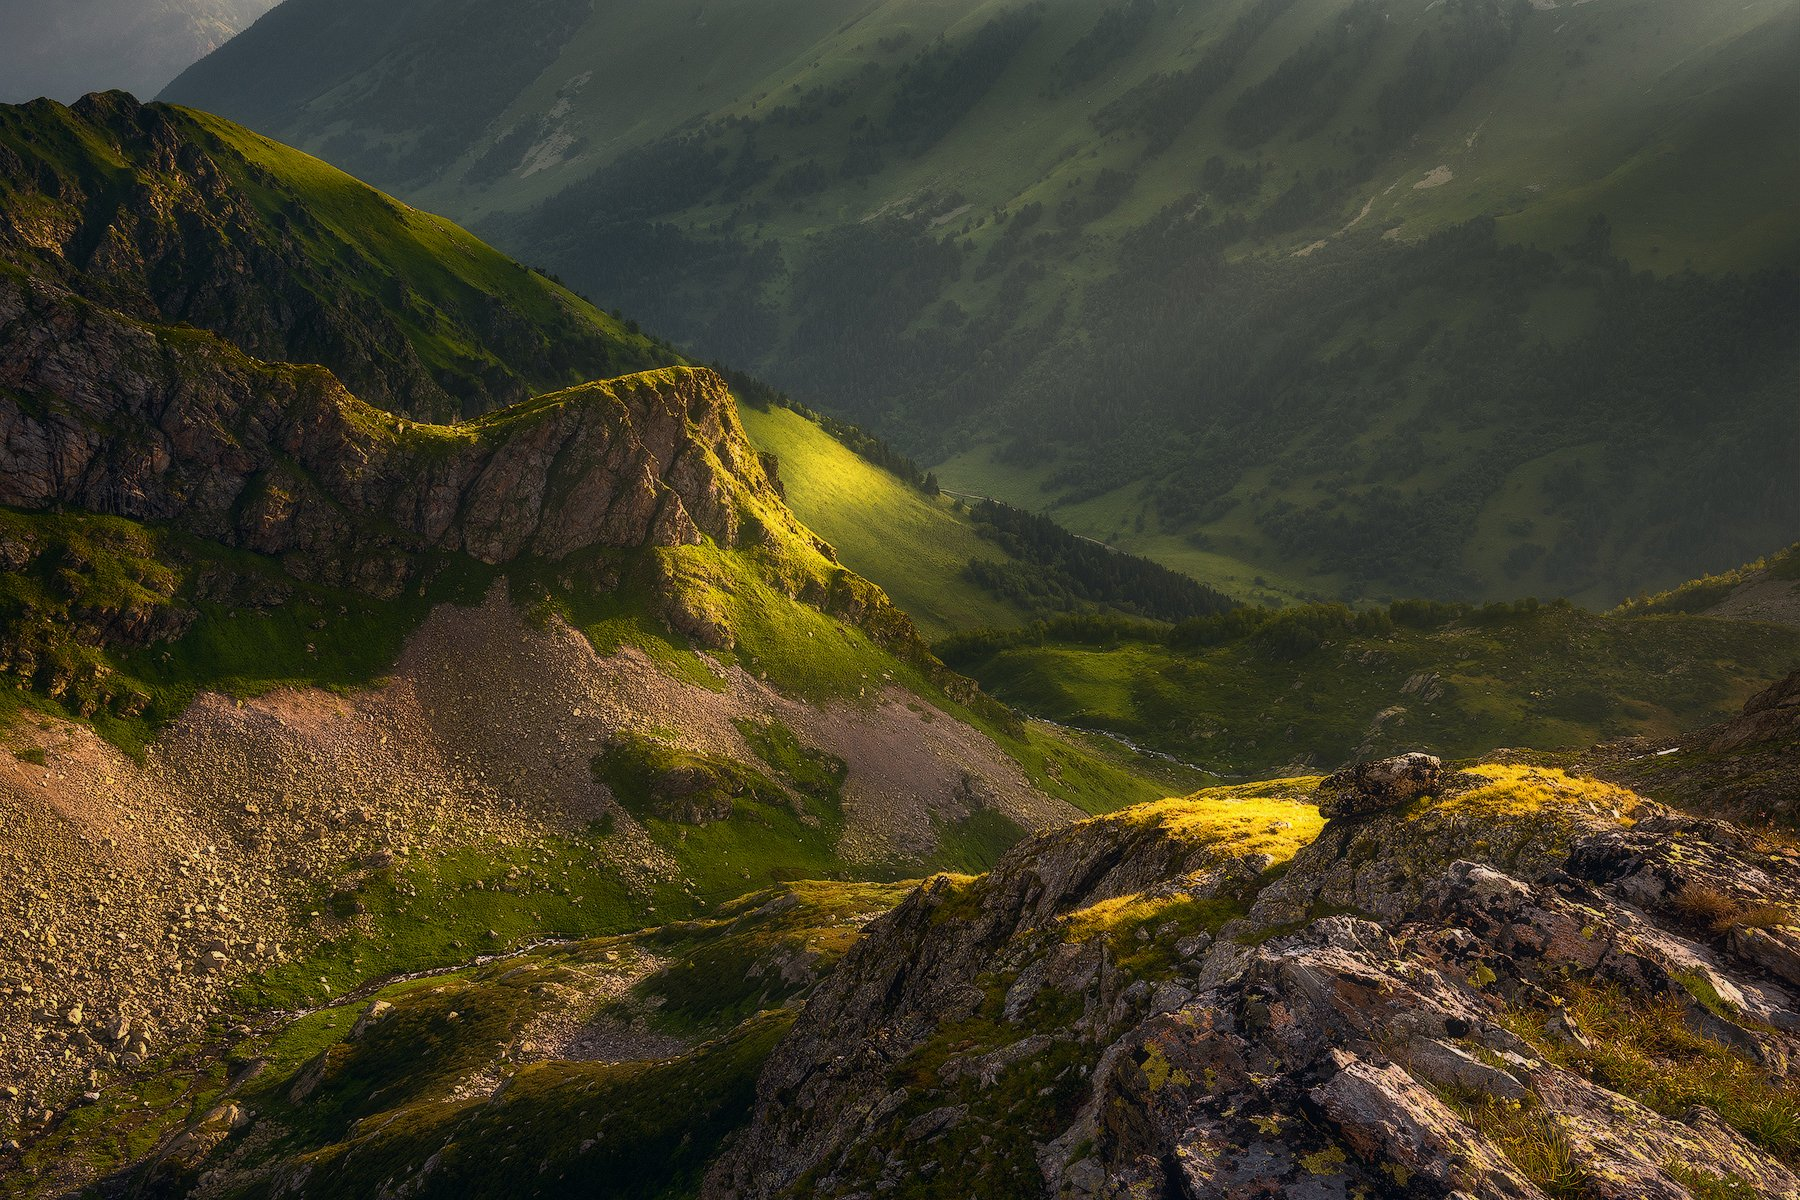 лето, горы, пейзаж, кавказ, архыз, Leschinskaya Tania